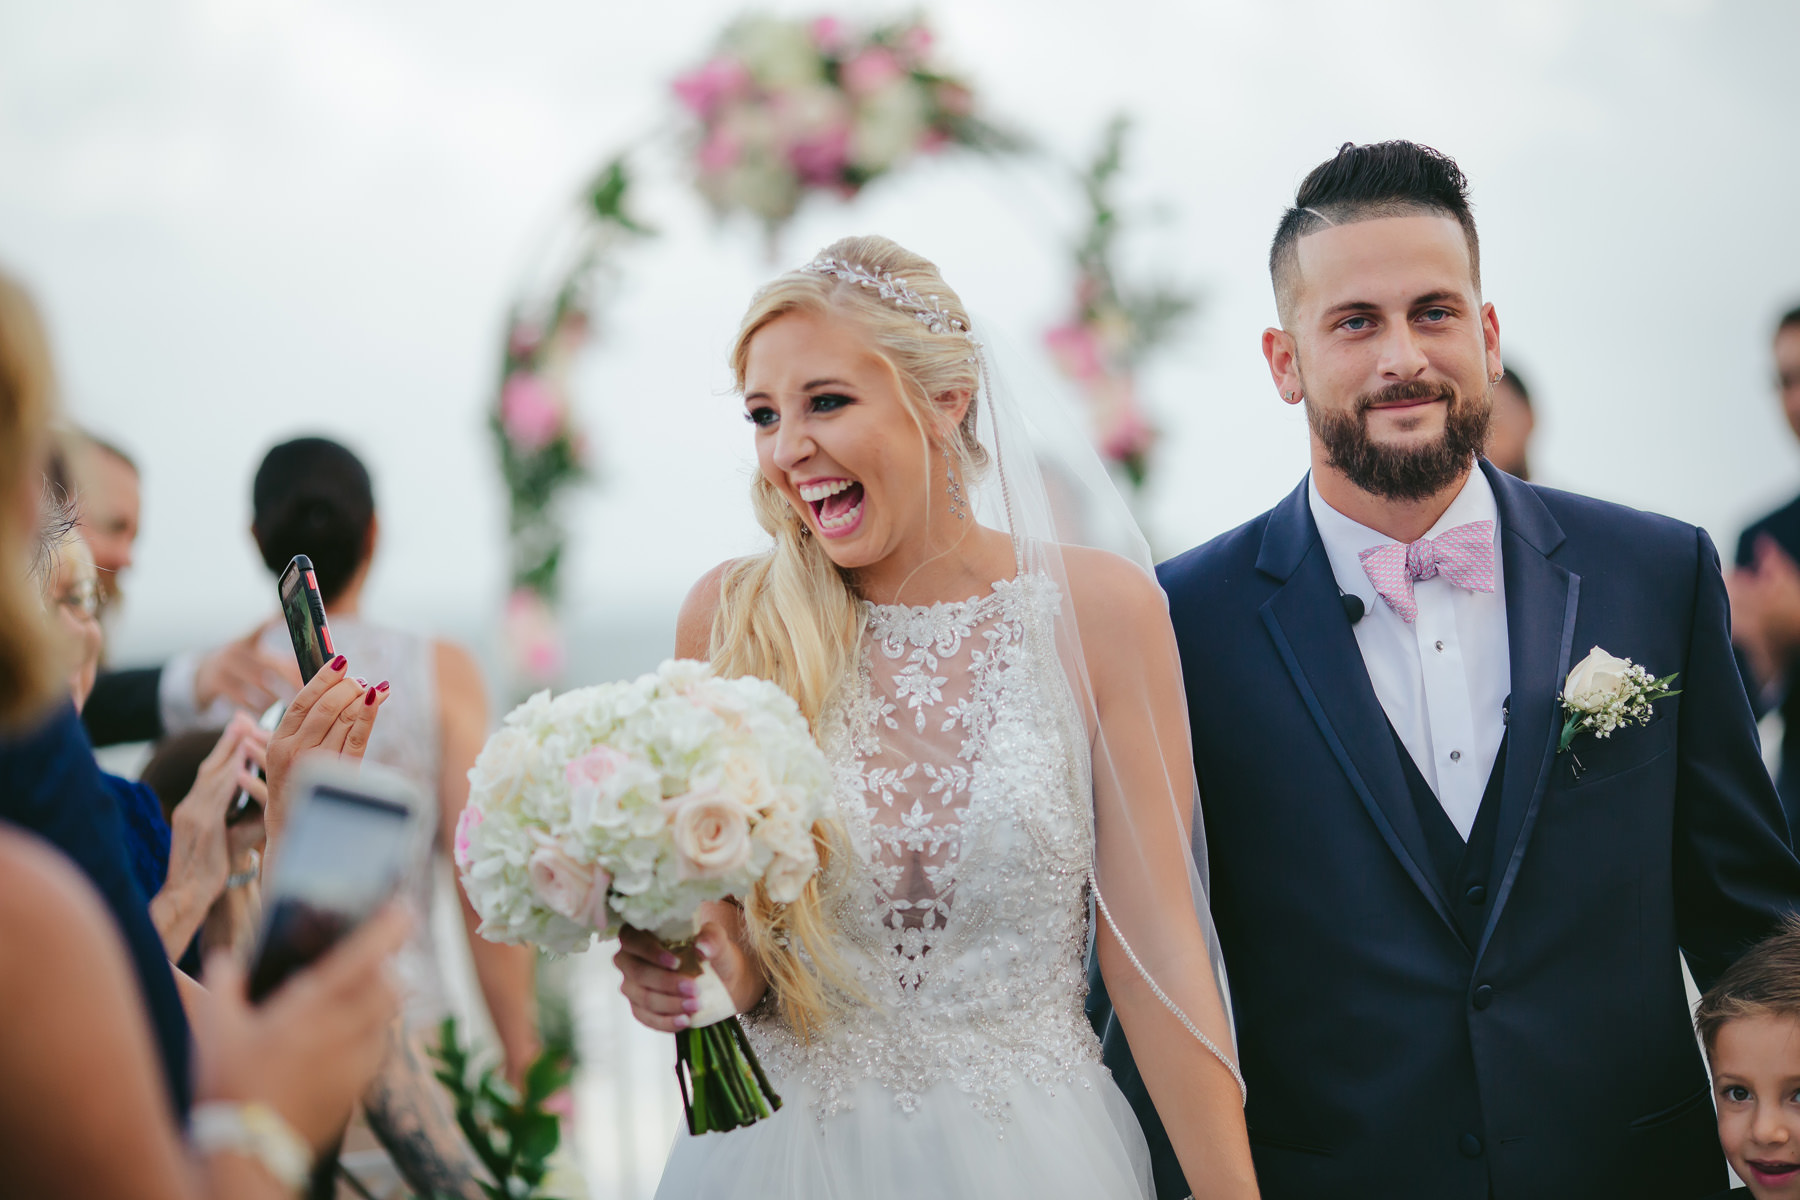 pure-joy-wedding-bliss-married-hillsboro-beach-club-tiny-house-photo.jpg